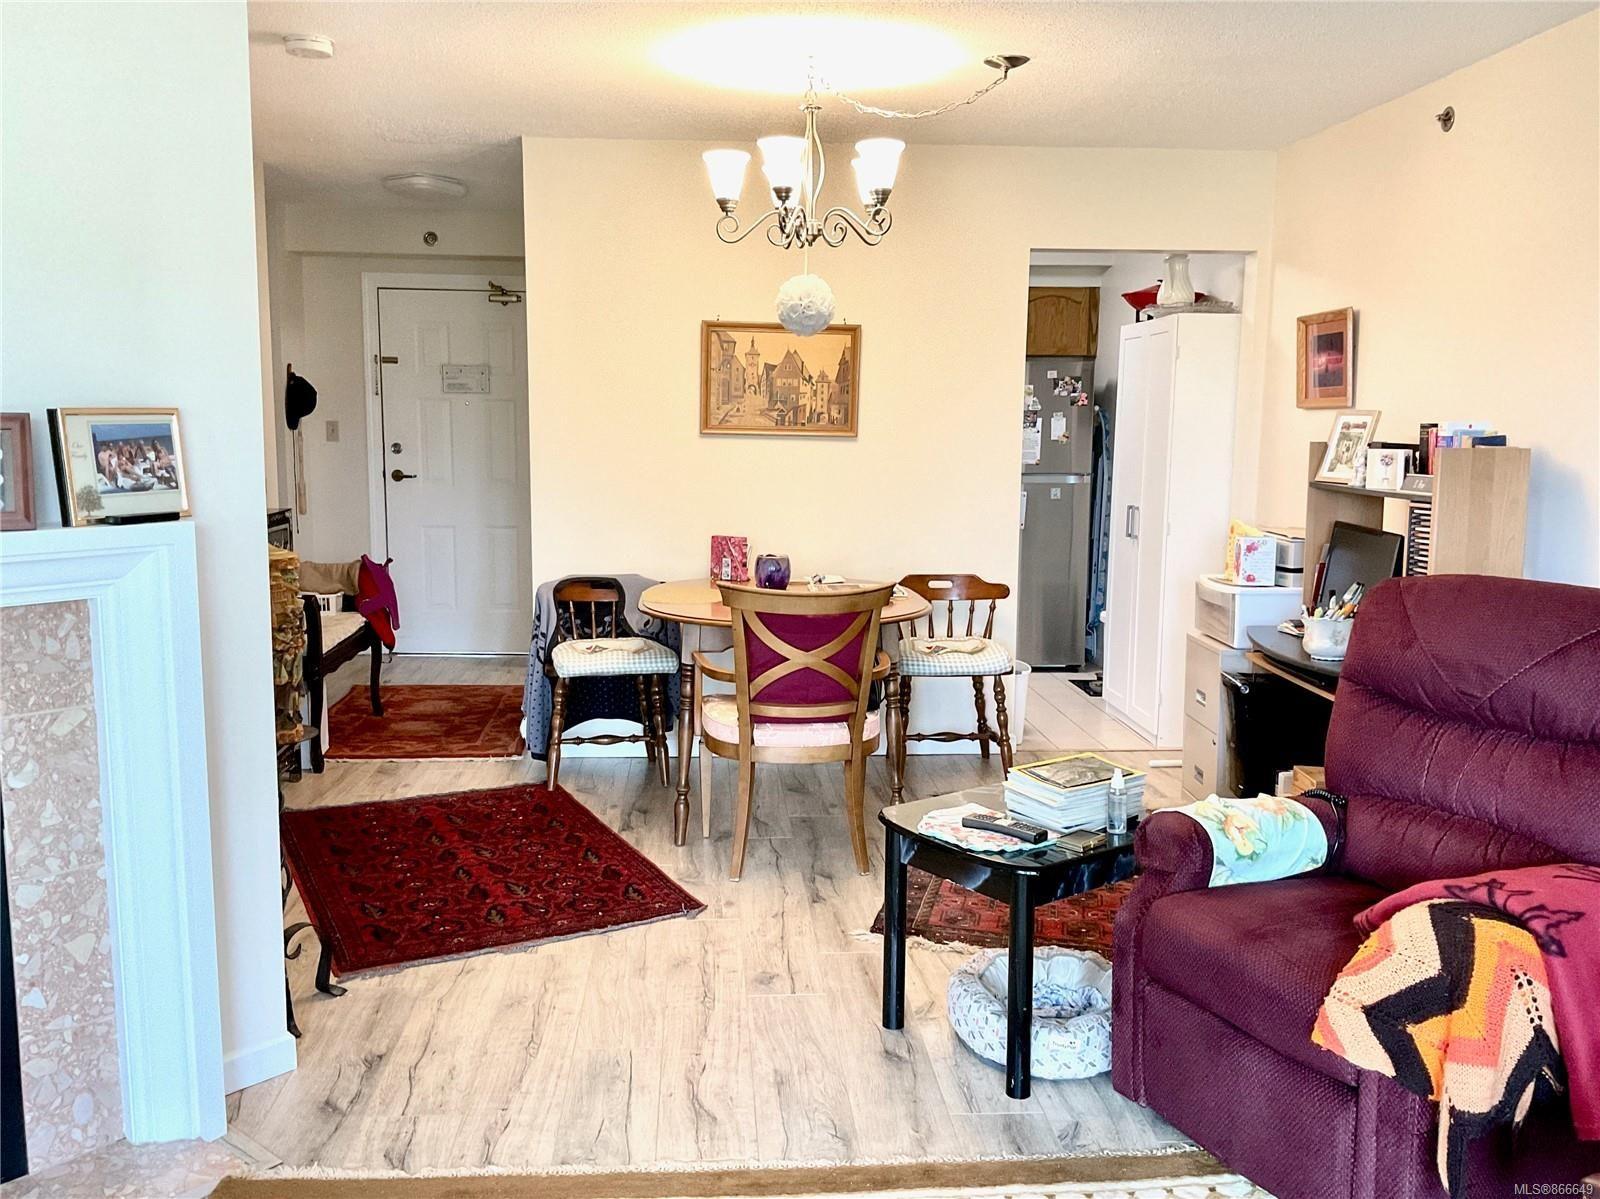 Photo 7: Photos: 308 3969 Shelbourne St in : SE Lambrick Park Condo for sale (Saanich East)  : MLS®# 866649